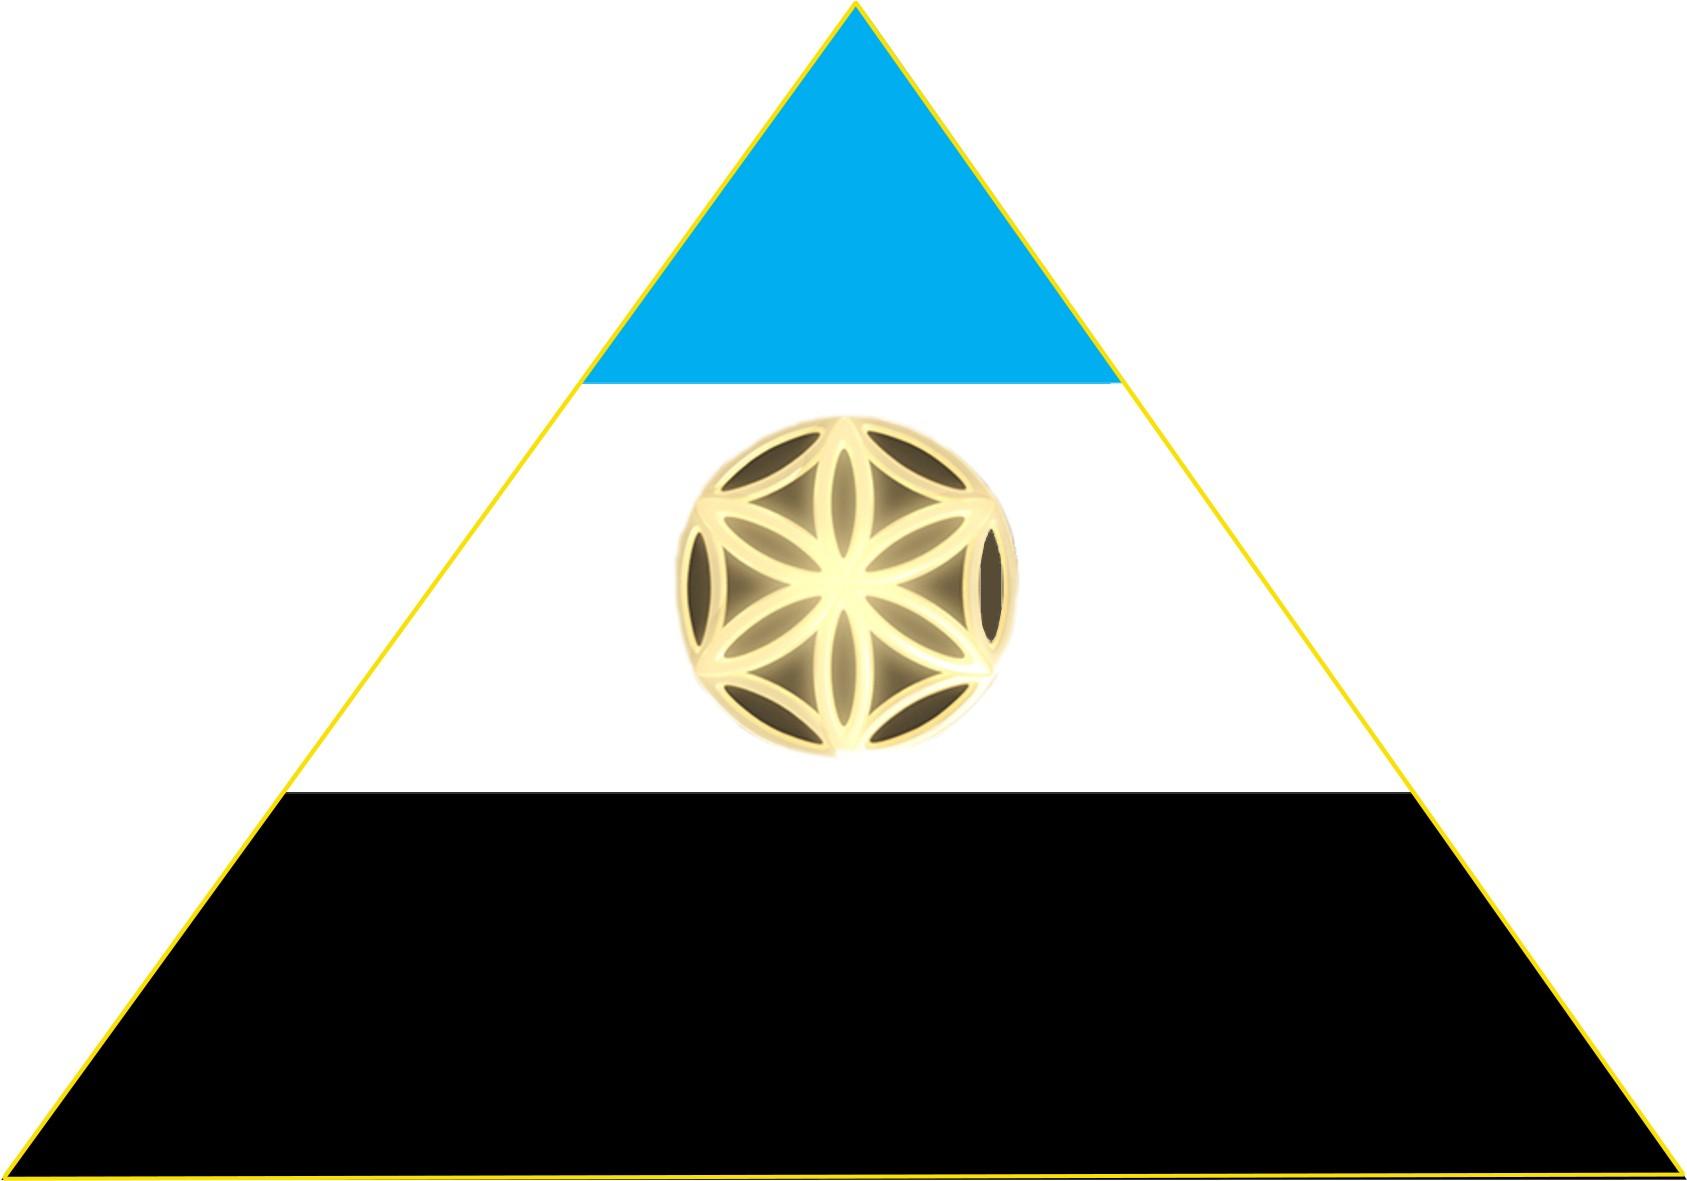 Asgardia insigna